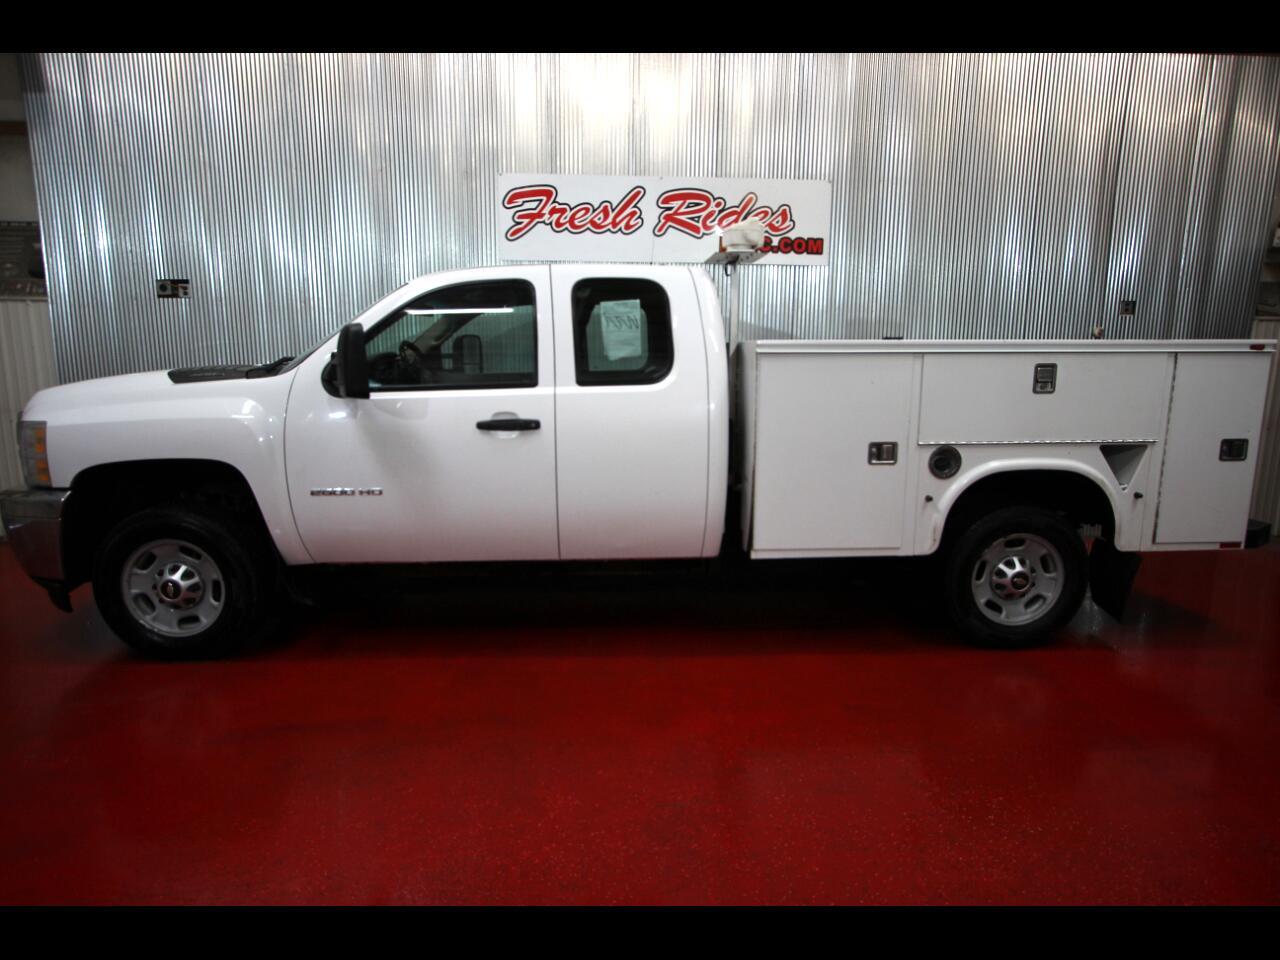 "2011 Chevrolet Silverado 2500HD 4WD Ext Cab 158.2"" Work Truck"